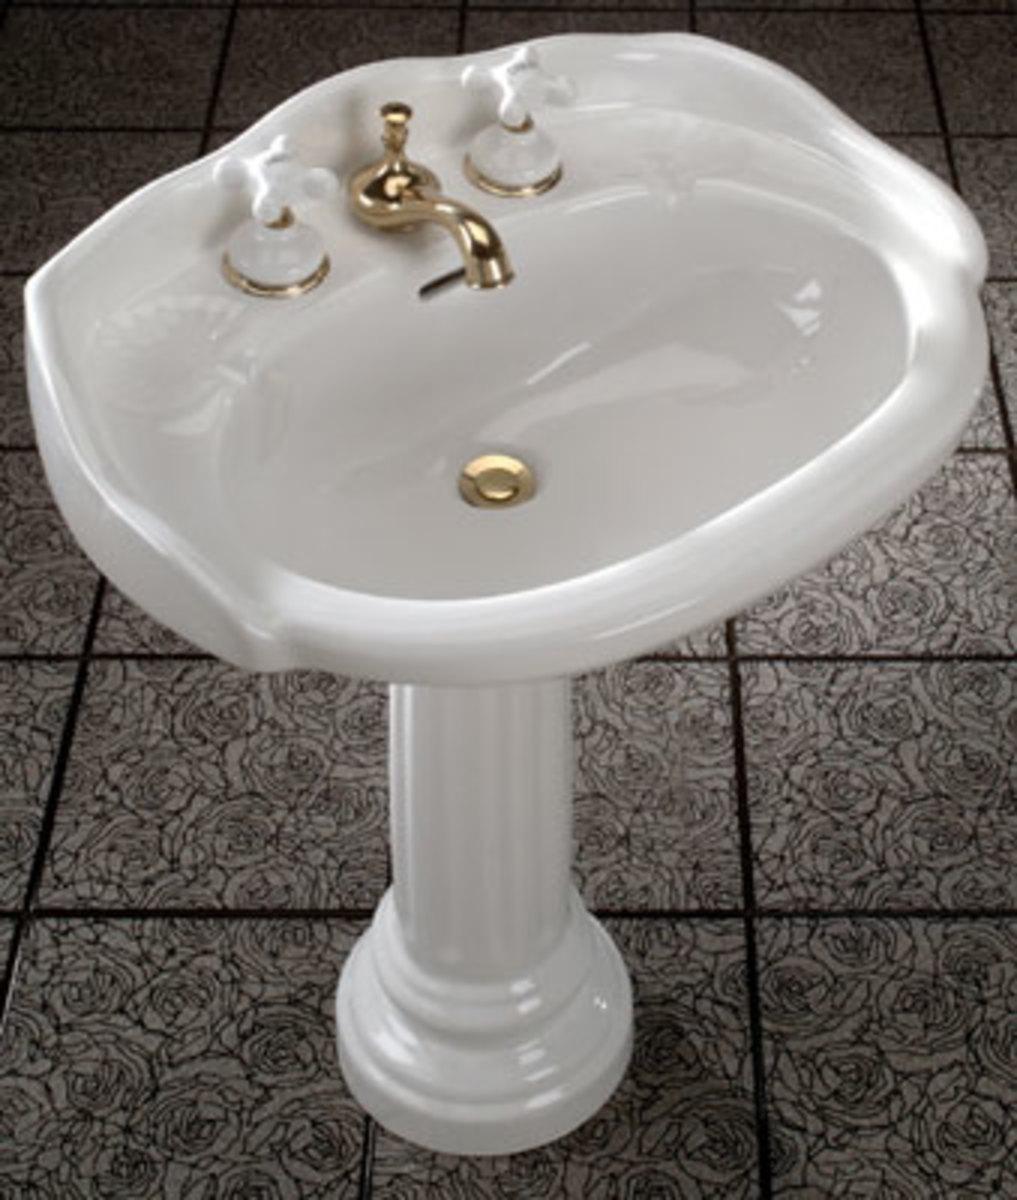 Vintage Tubs And Bath Fixtures Dengarden